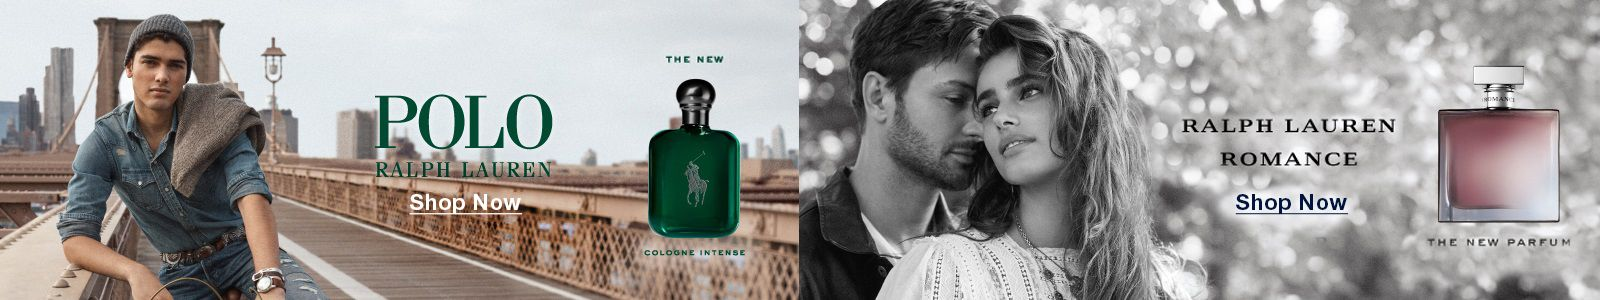 Polo Ralph Lauren, Shop Now, The New Cologne Intense, Ralph Lauren Romance, Shop Now, The New Parfum